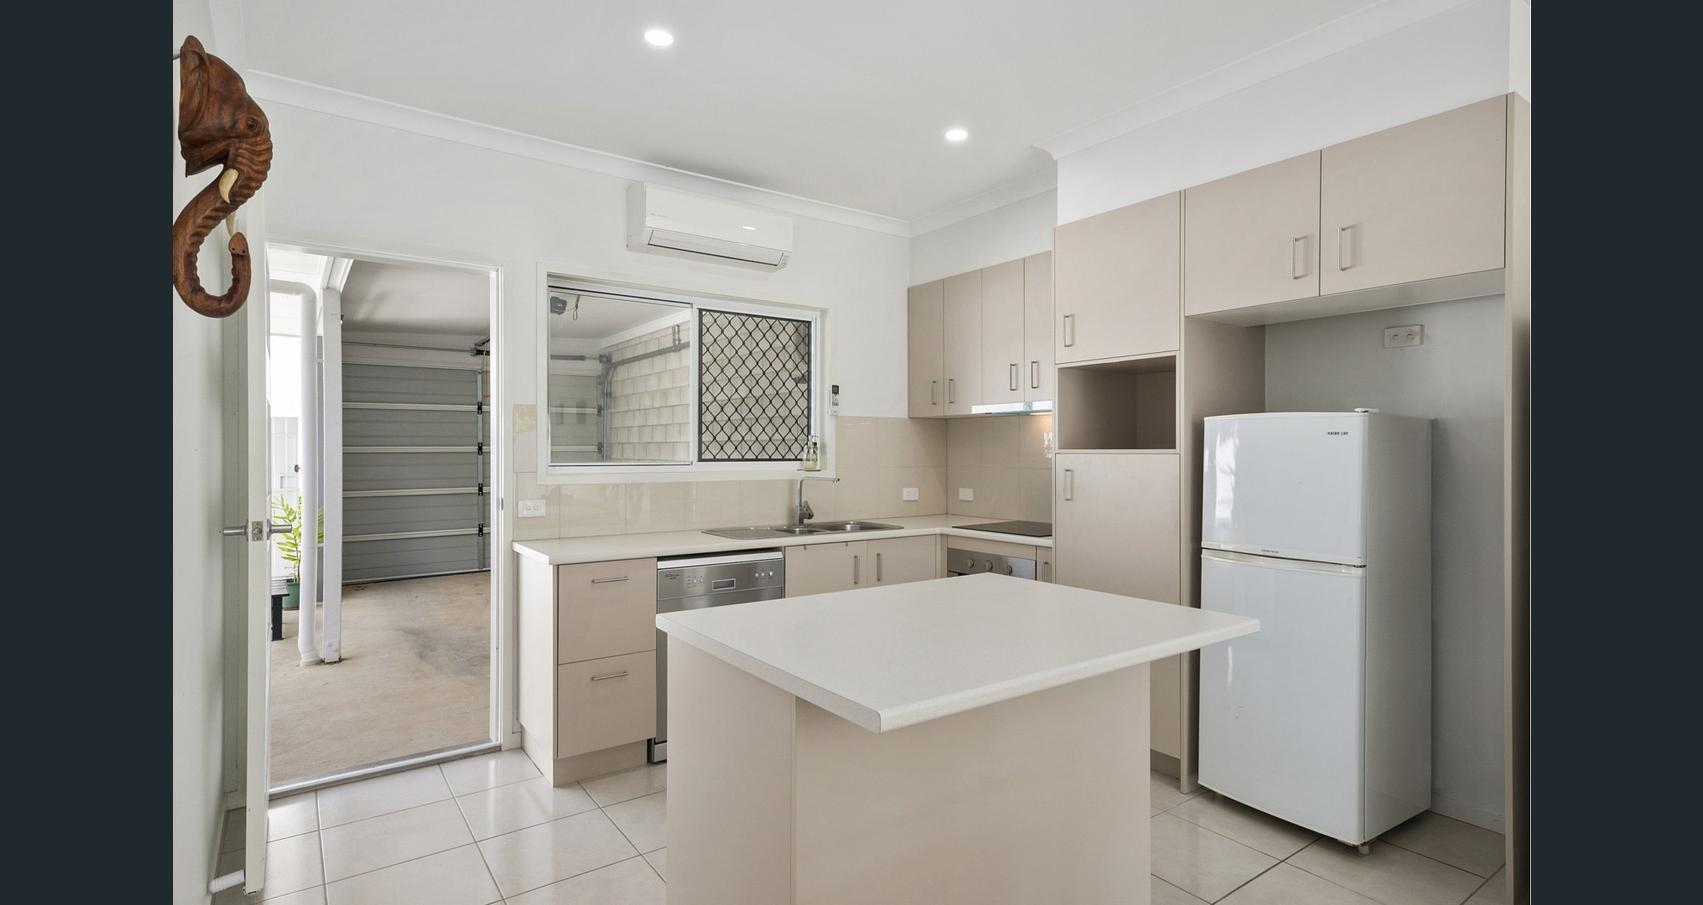 1/6 Gympie Street North, Landsborough QLD 4550, Image 0